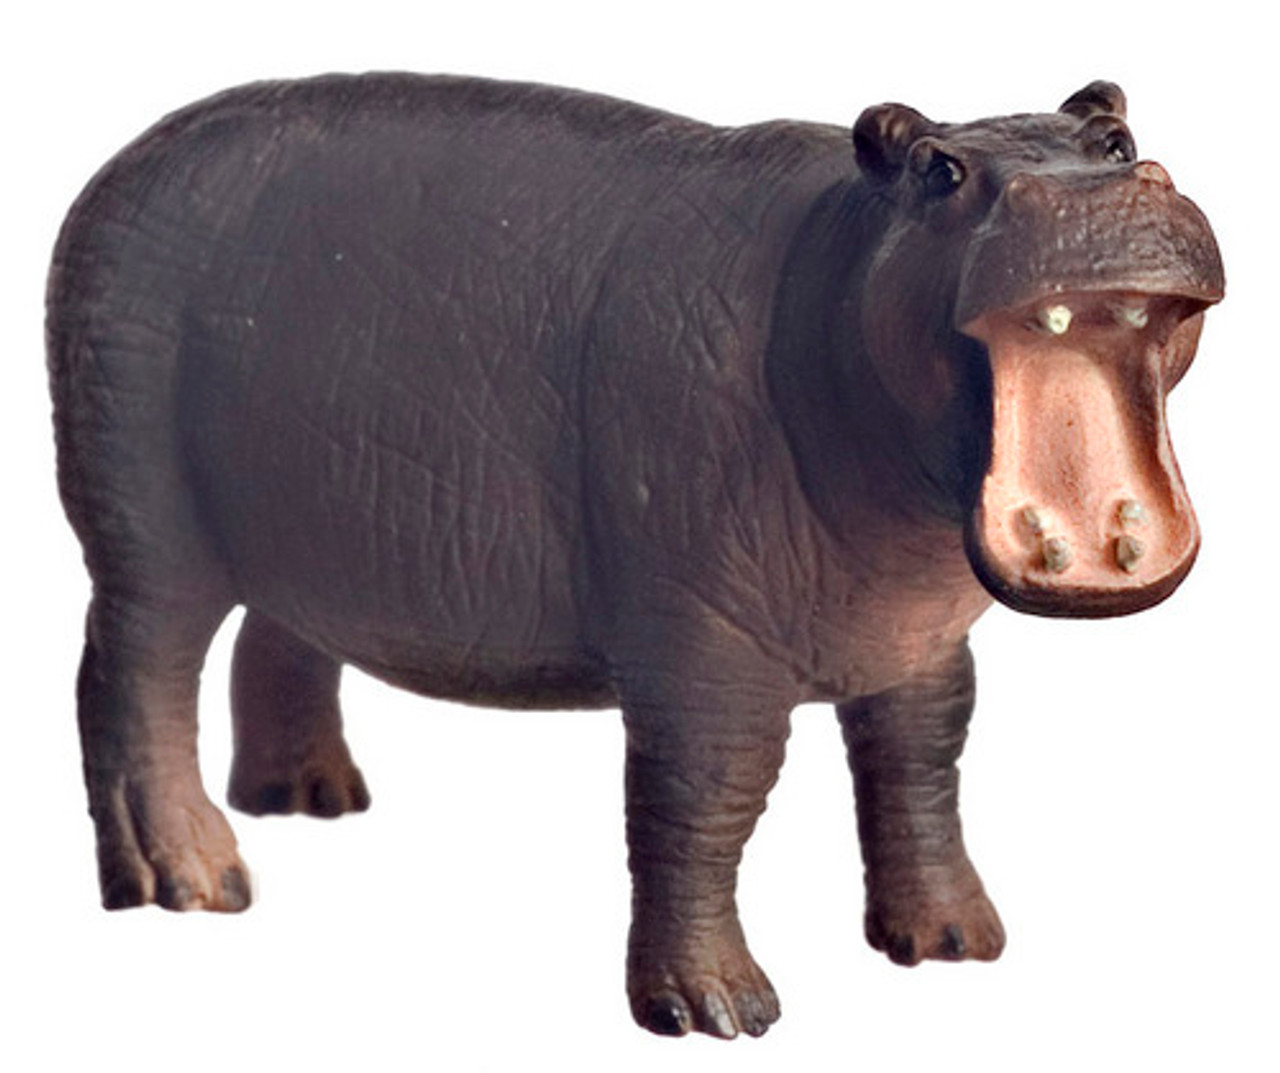 Dollhouse City - Dollhouse Miniatures Scale Hippopotamus